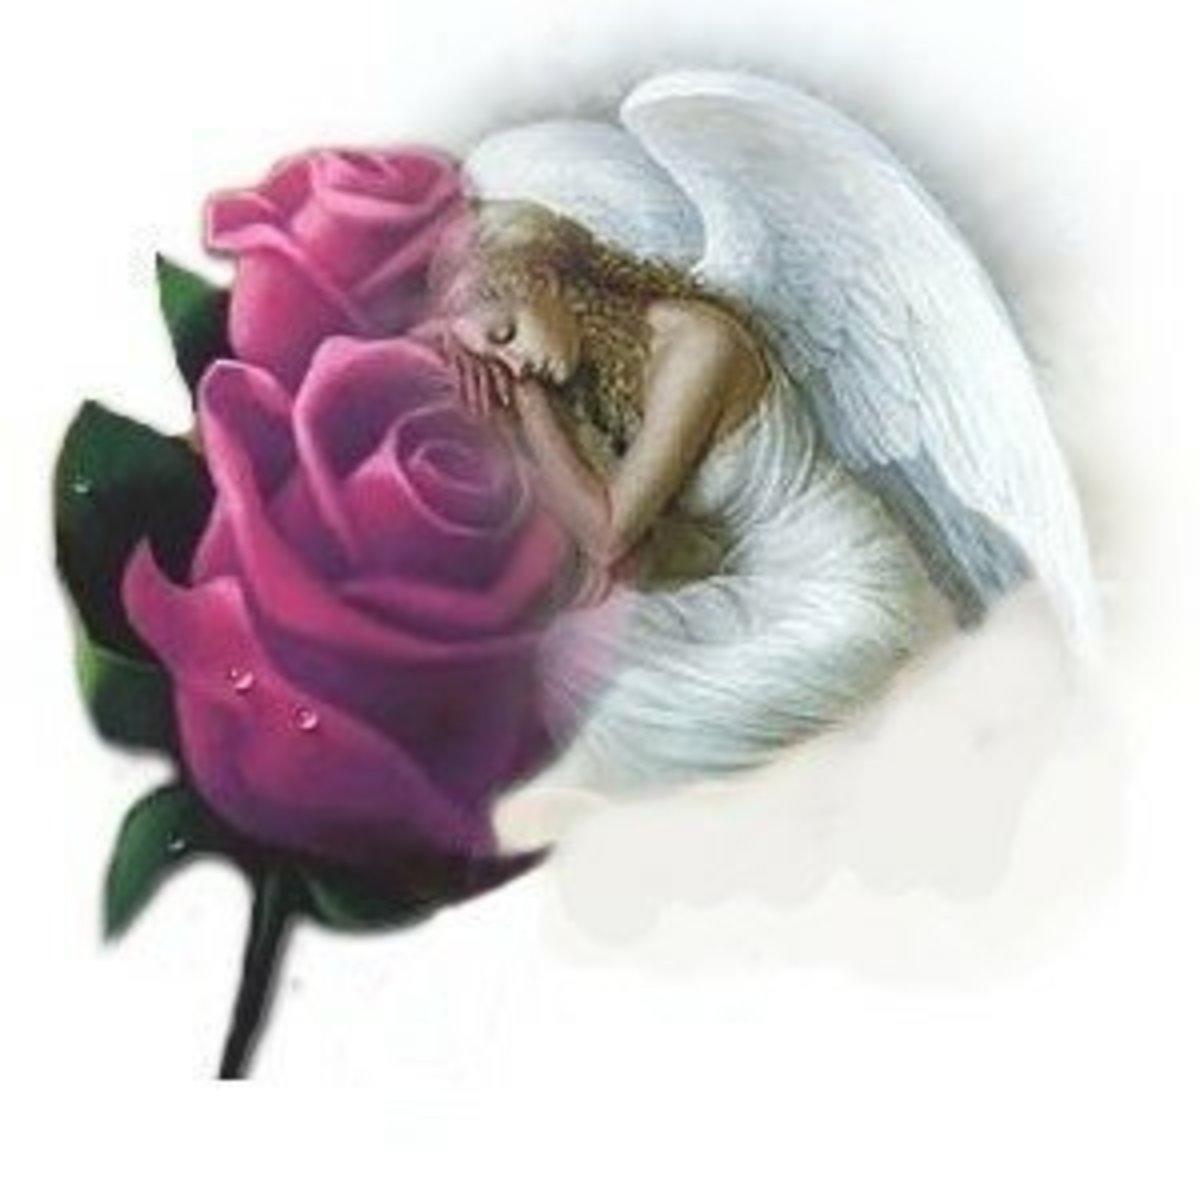 Myangel's Clipart » Religious » Angel in rose